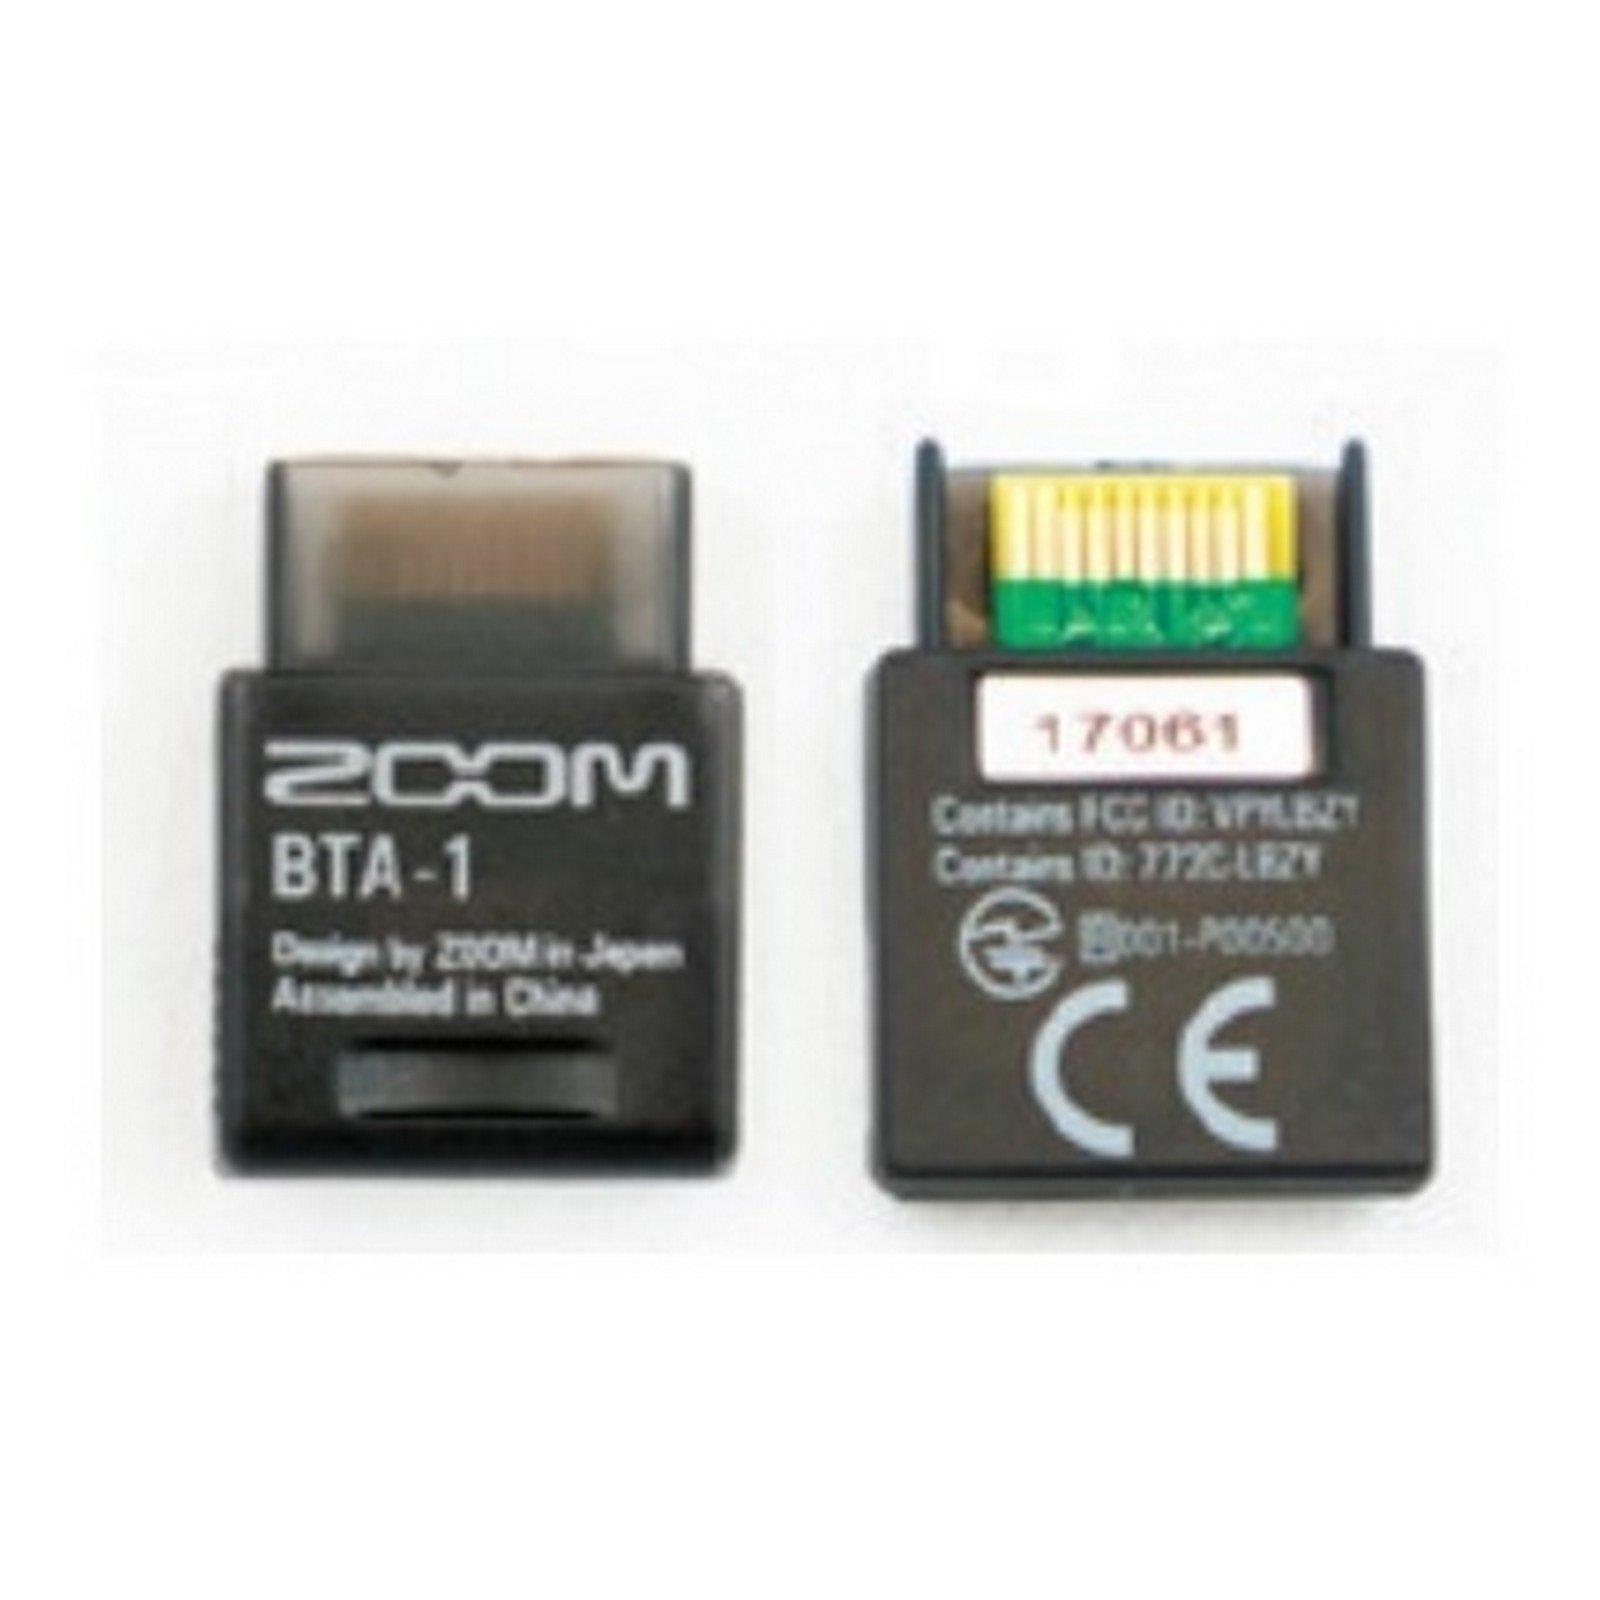 Zoom BTA-1, Wireless Bluetooth Adapter for ARQ AR-48